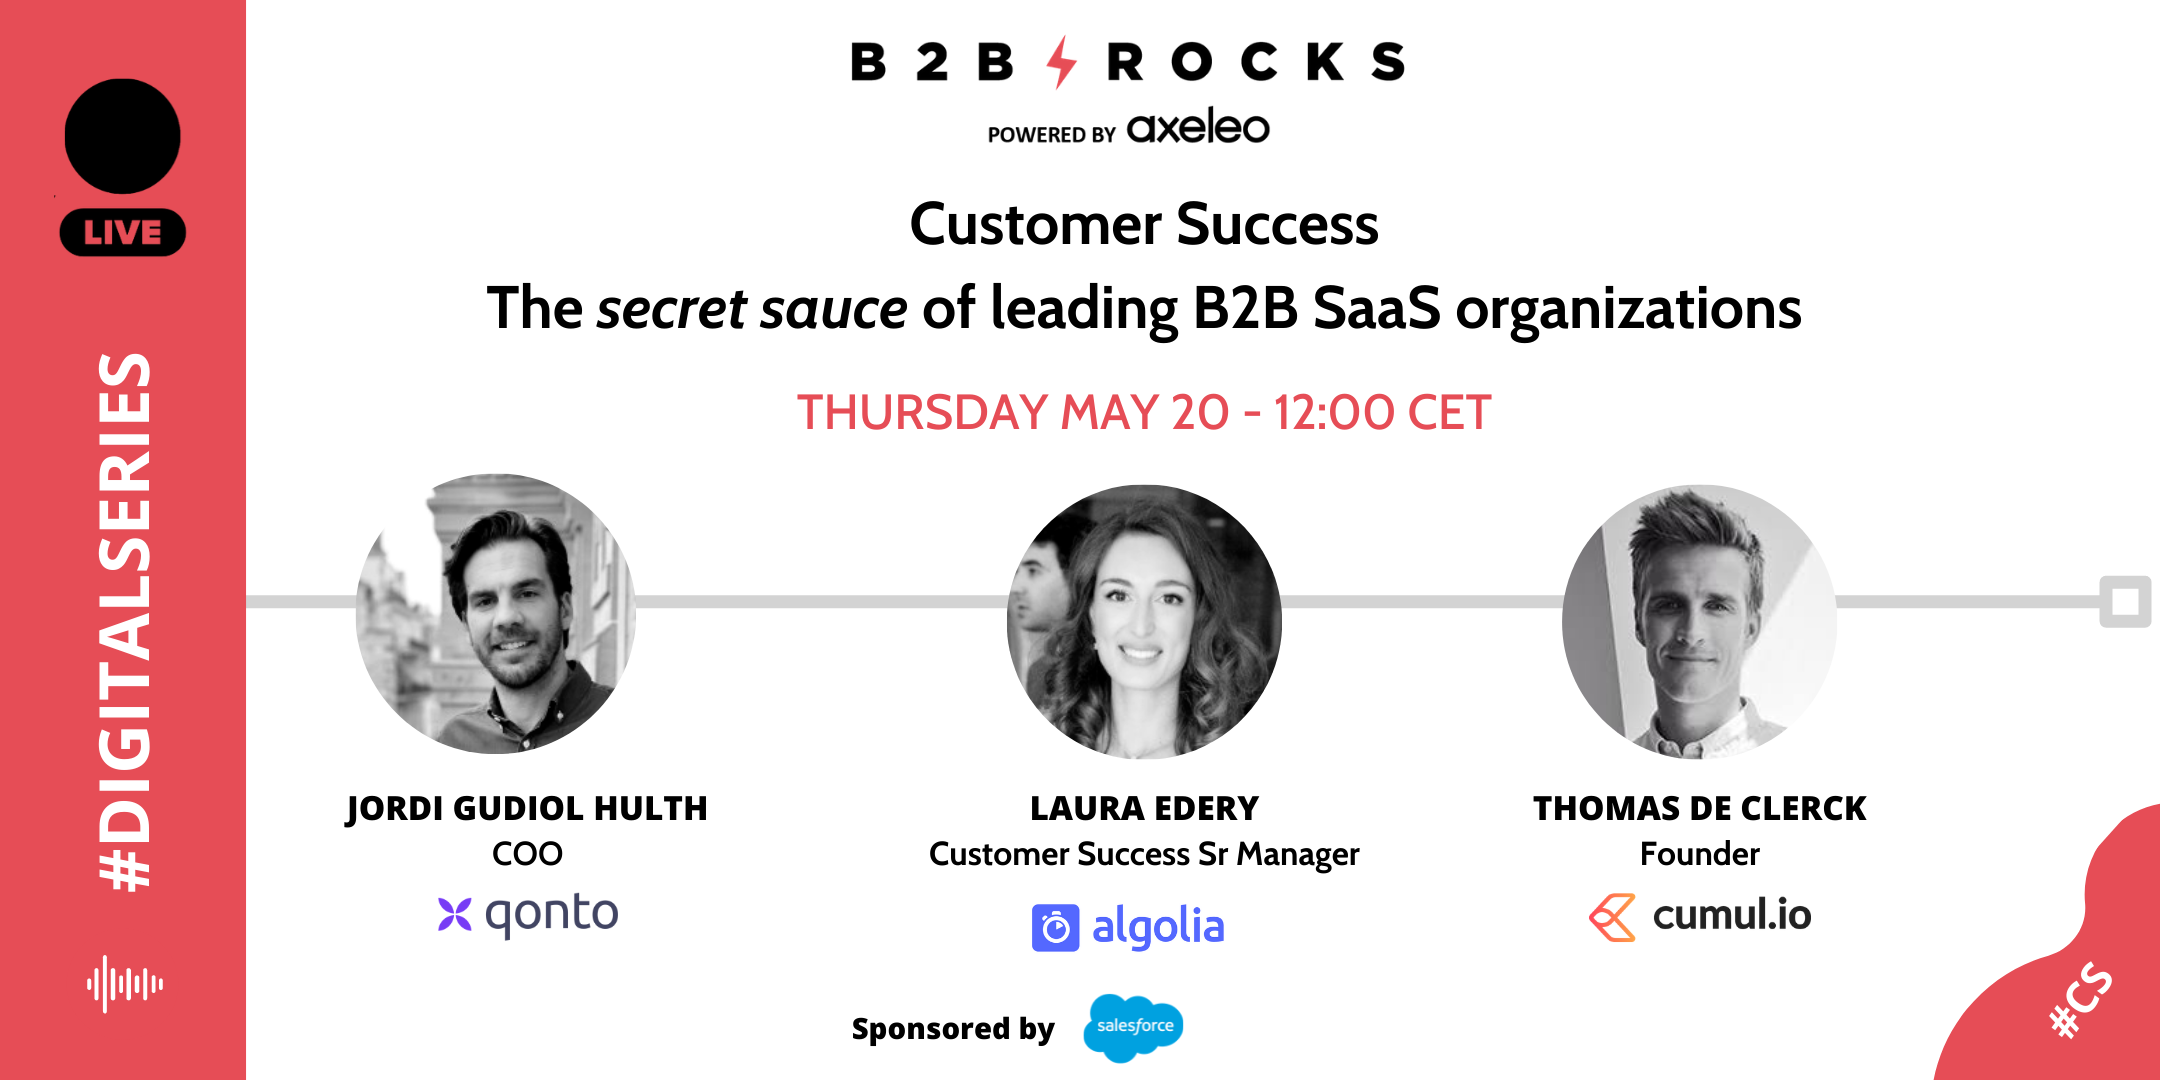 B2B Rocks Customer Sucess Speakers